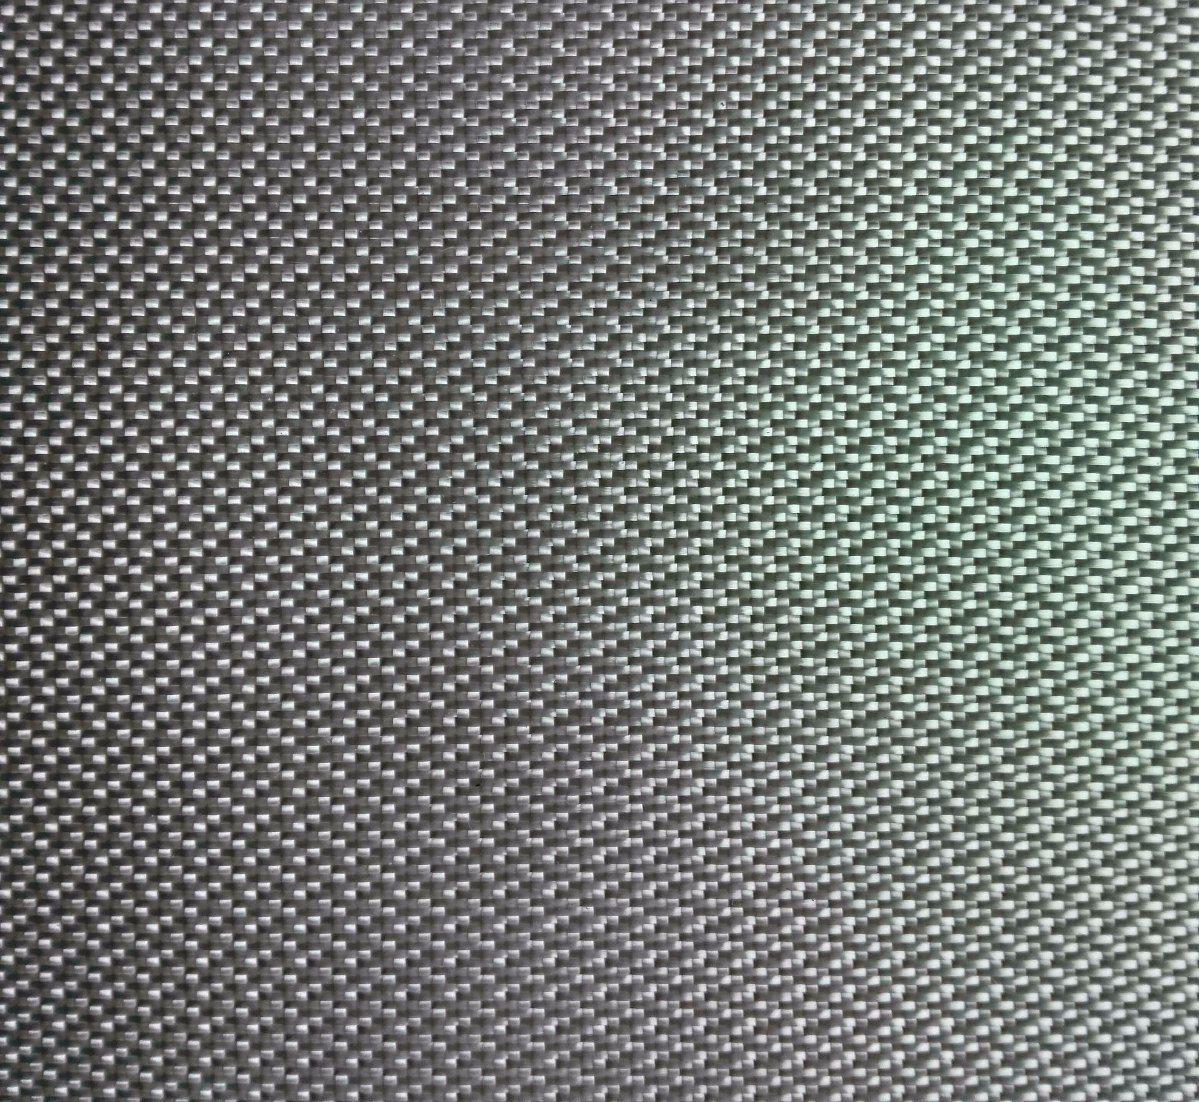 Fiberglass Twill Clothes for Composite